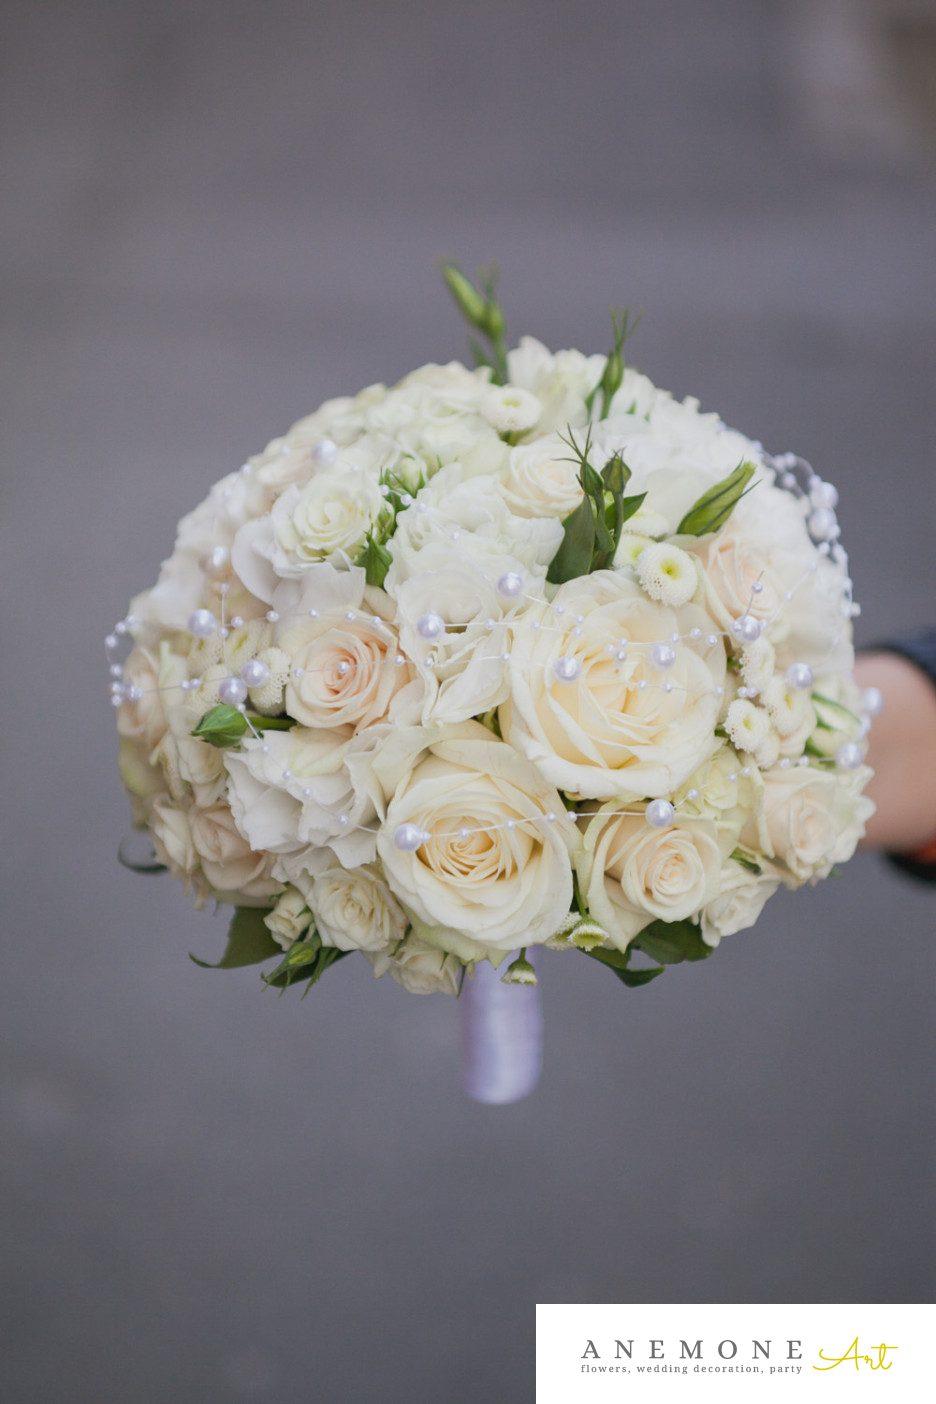 Poza, foto cu Flori de nunta alb, buchet mireasa, crem, lisianthus, matricaria eximia, mini-rosa, perle, trandafiri in Arad, Timisoara, Oradea (wedding flowers, bouquets) nunta Arad, Timisoara, Oradea